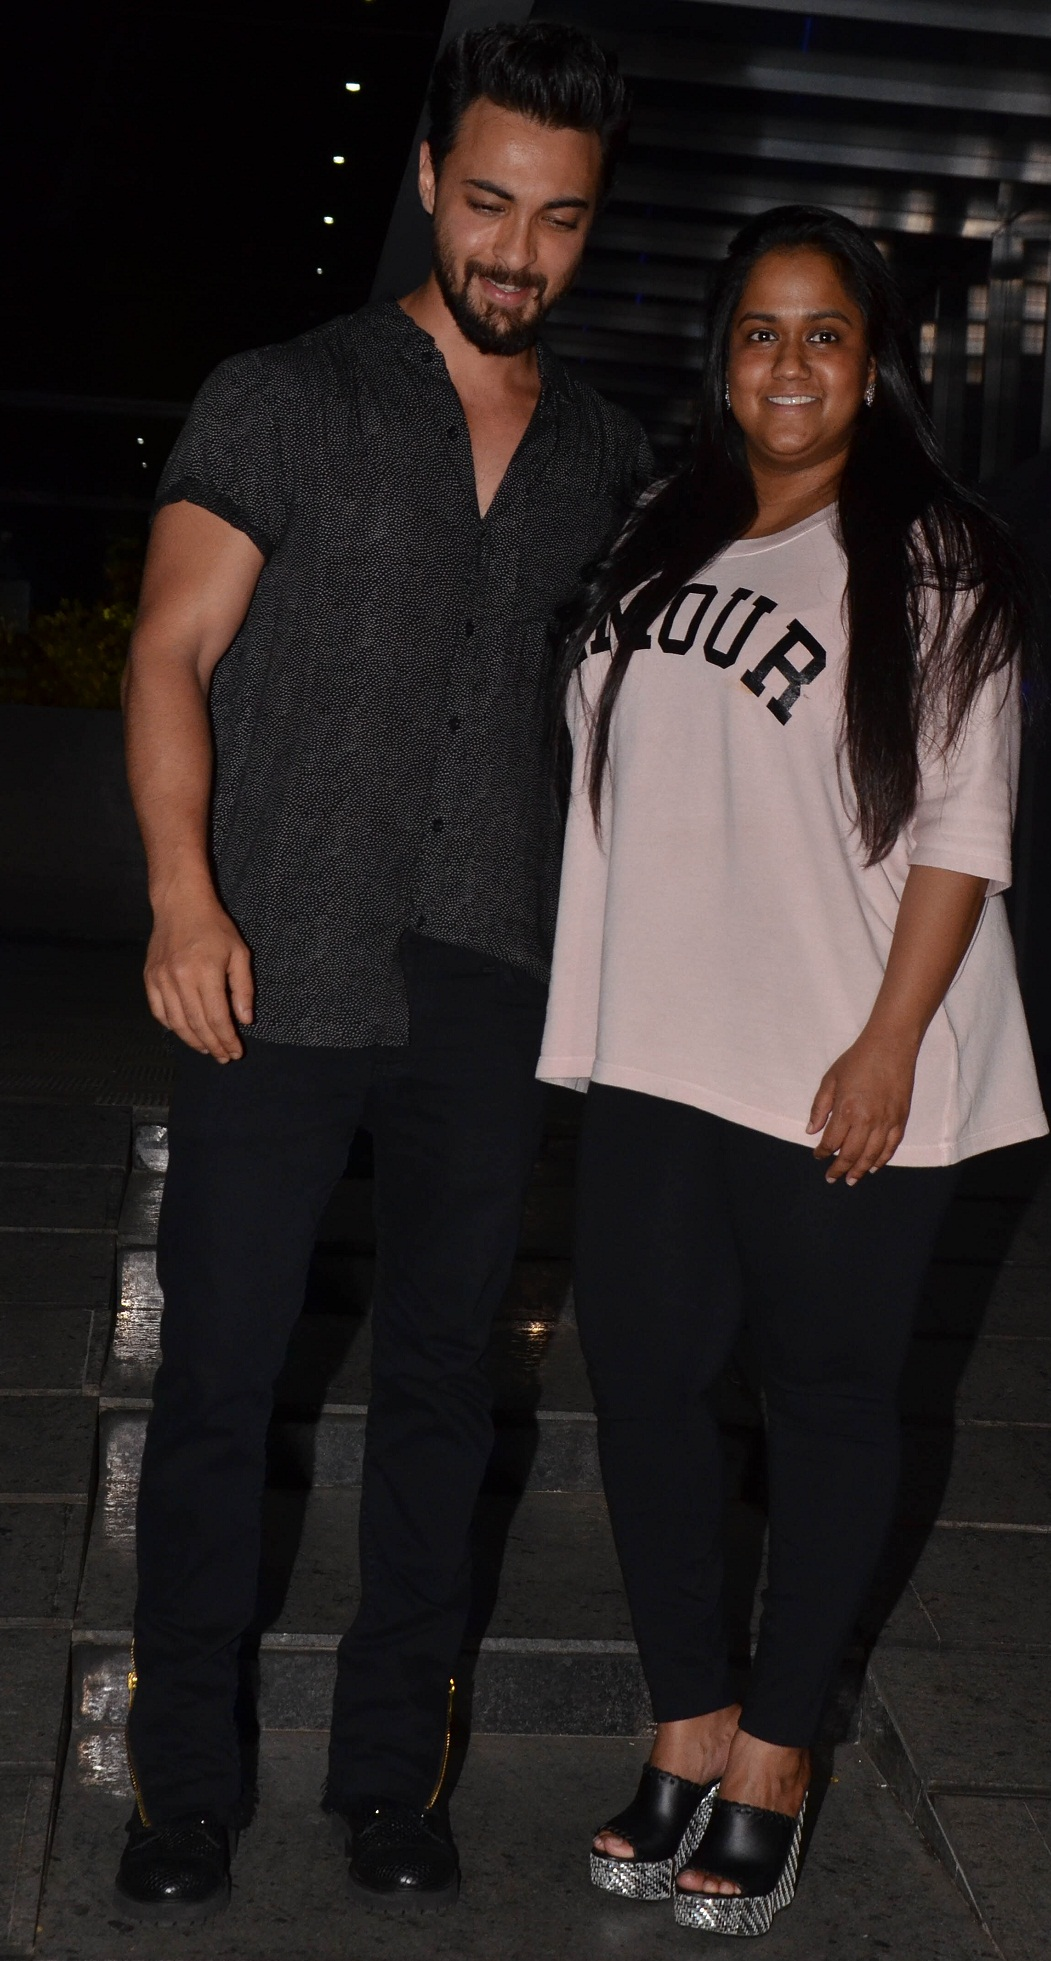 Bollywood Tadka, आयुष शर्मा इमेज, आयुष शर्मा फोटो, आयुष शर्मा पिक्चर, अर्पिता खान इमेज, अर्पिता खान फोटो, अर्पिता खान पिक्चर